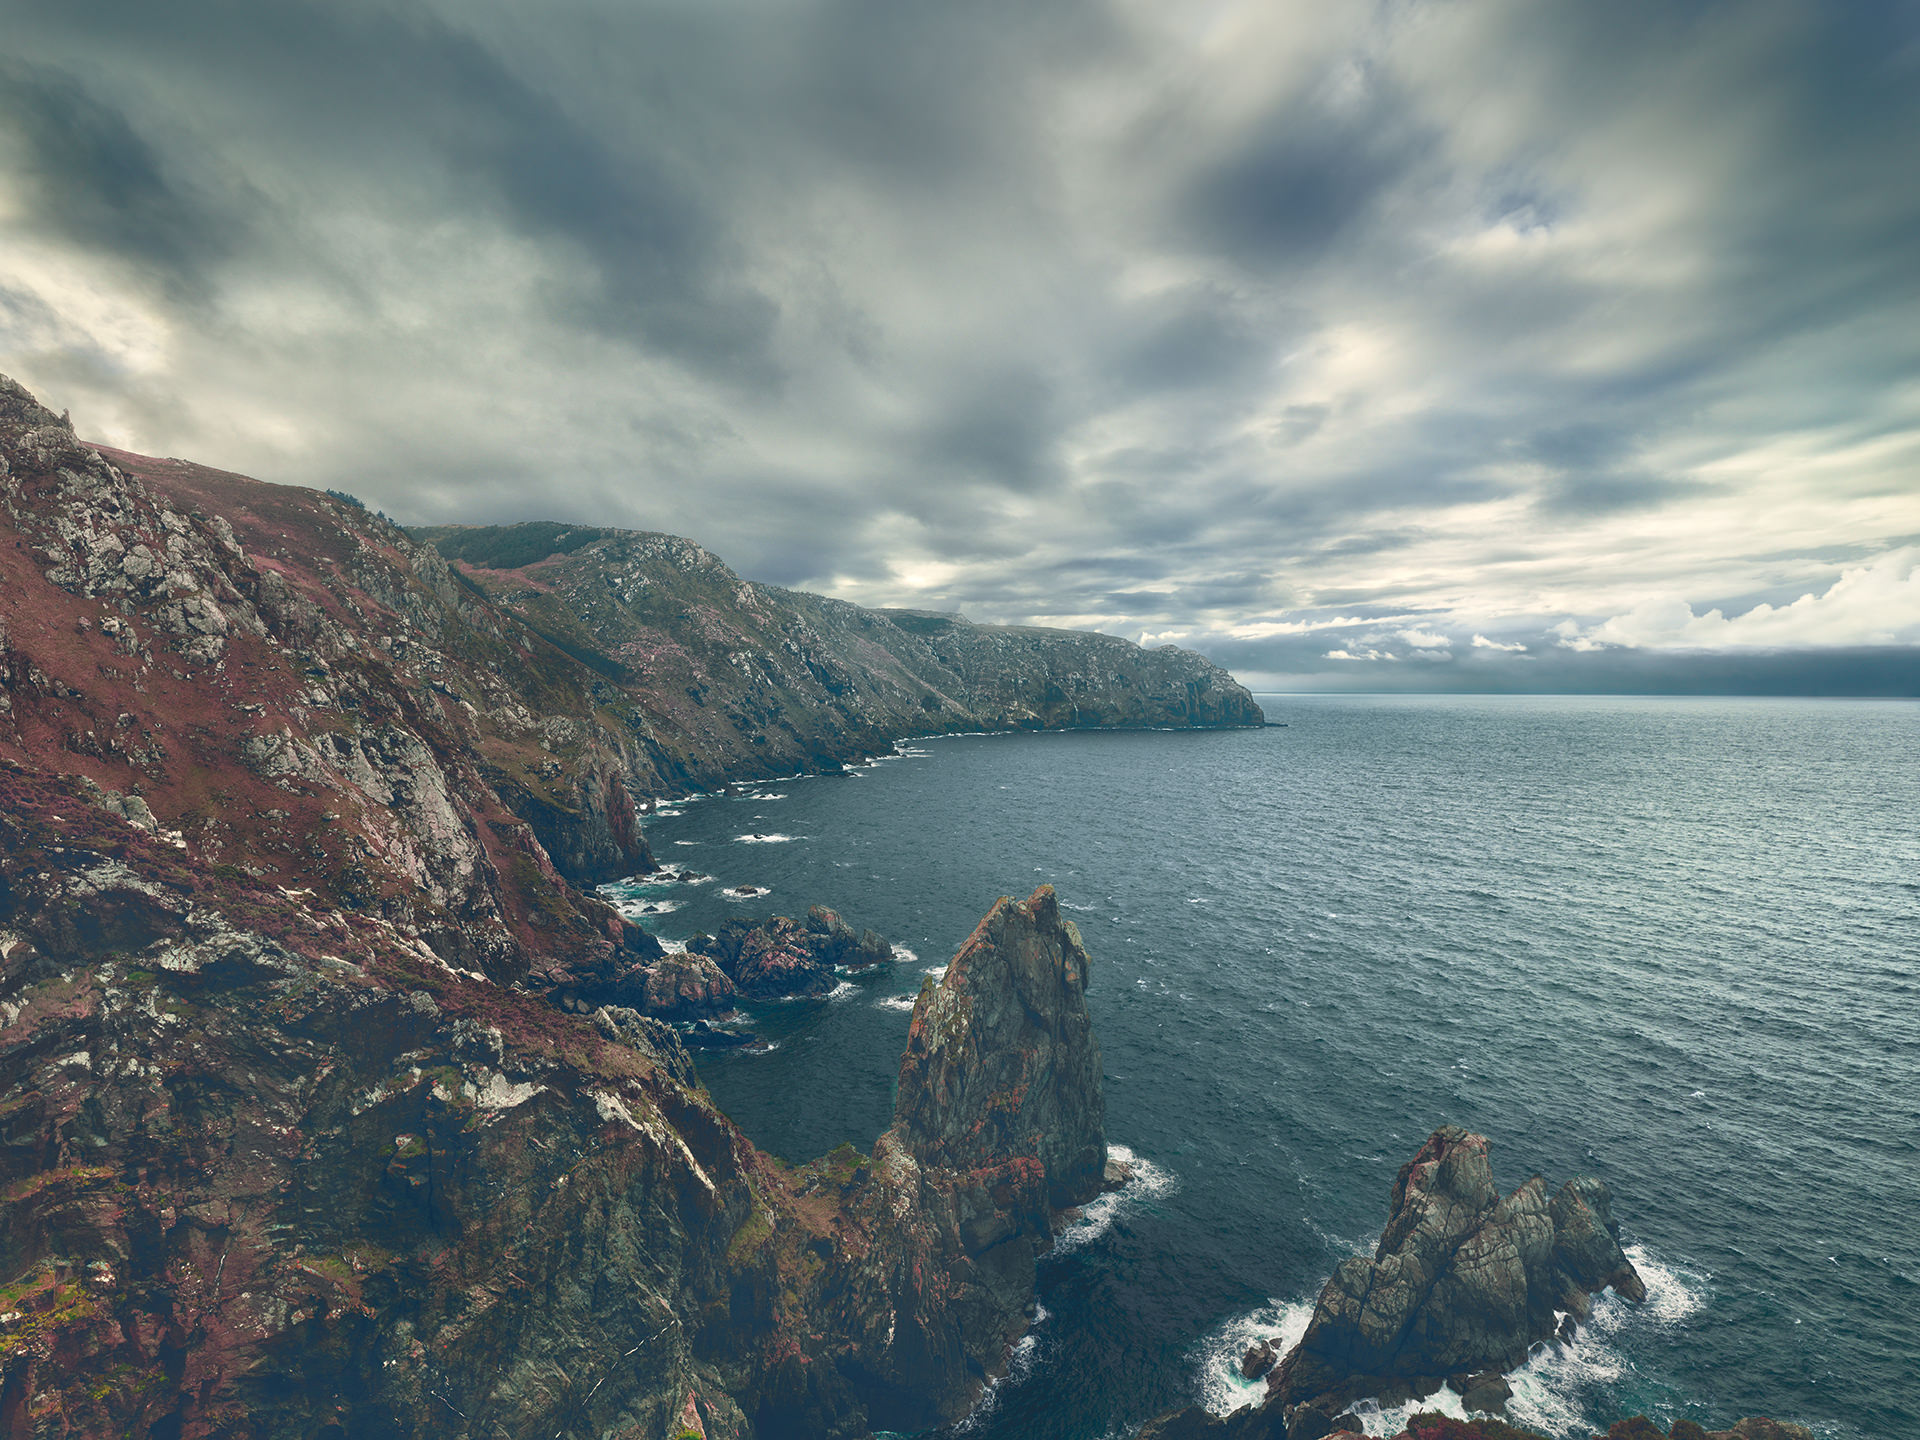 ©ankeluckmann1726, coast, galicia, green, landscape, rocks, spain, anke luckmann, www.ankeluckmann.com